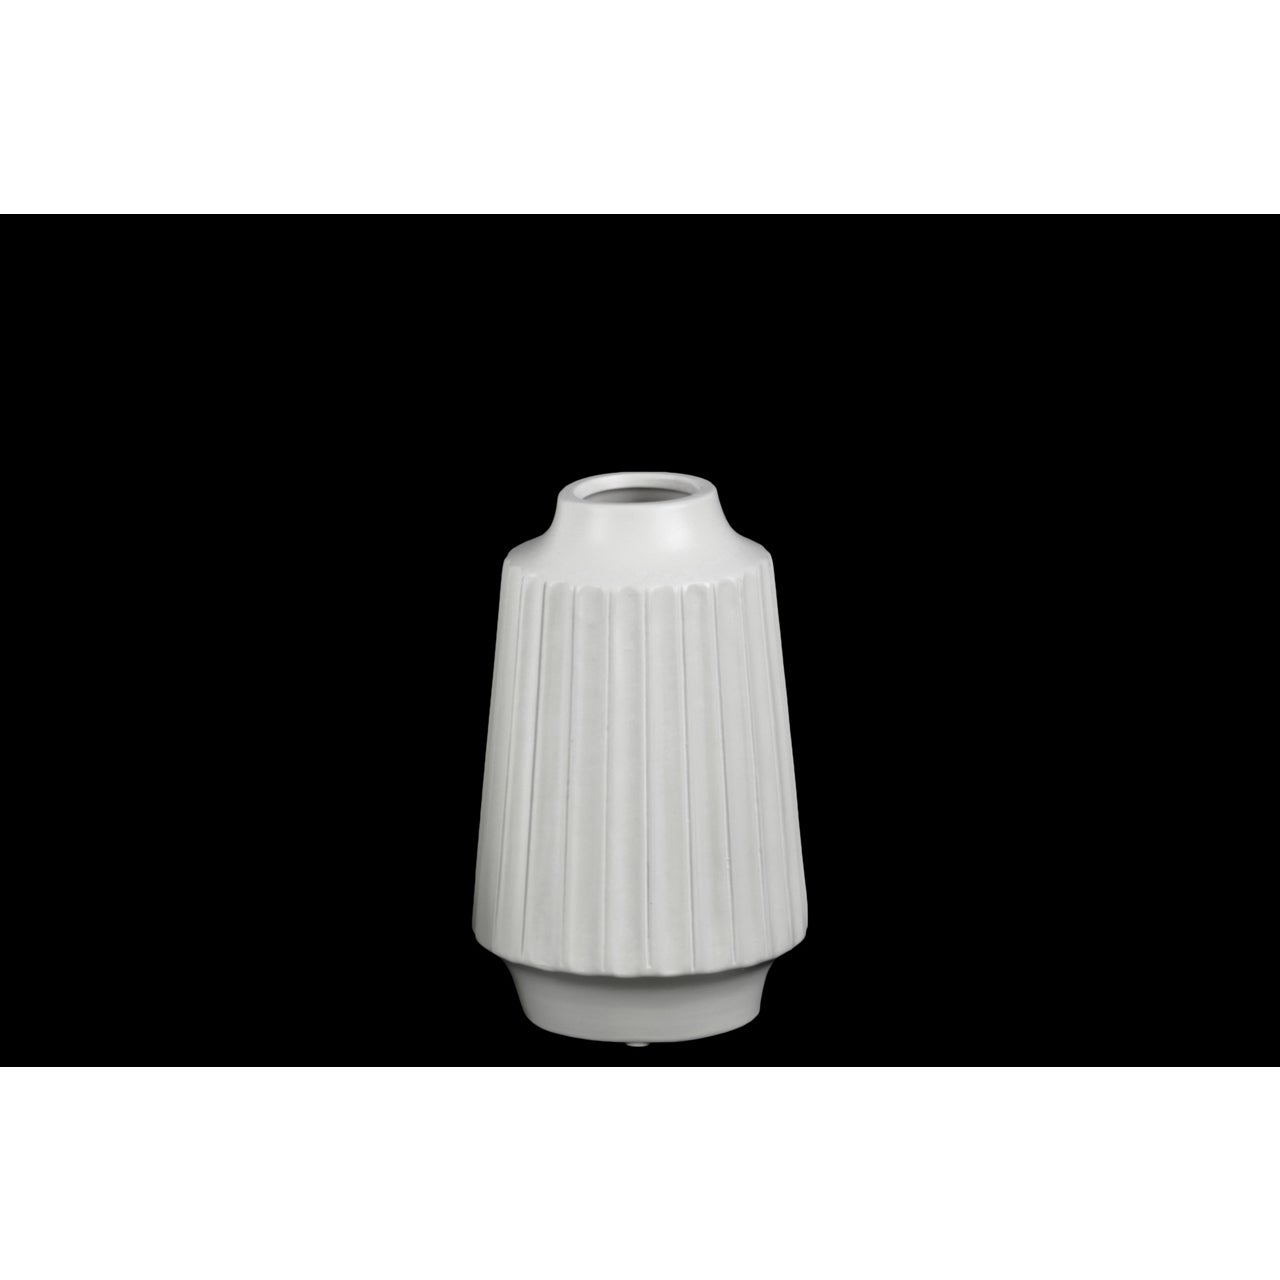 Matte White Ceramic Small Ribbed Round Lip Round Vase (Ceramic Vase Matte Finish White)